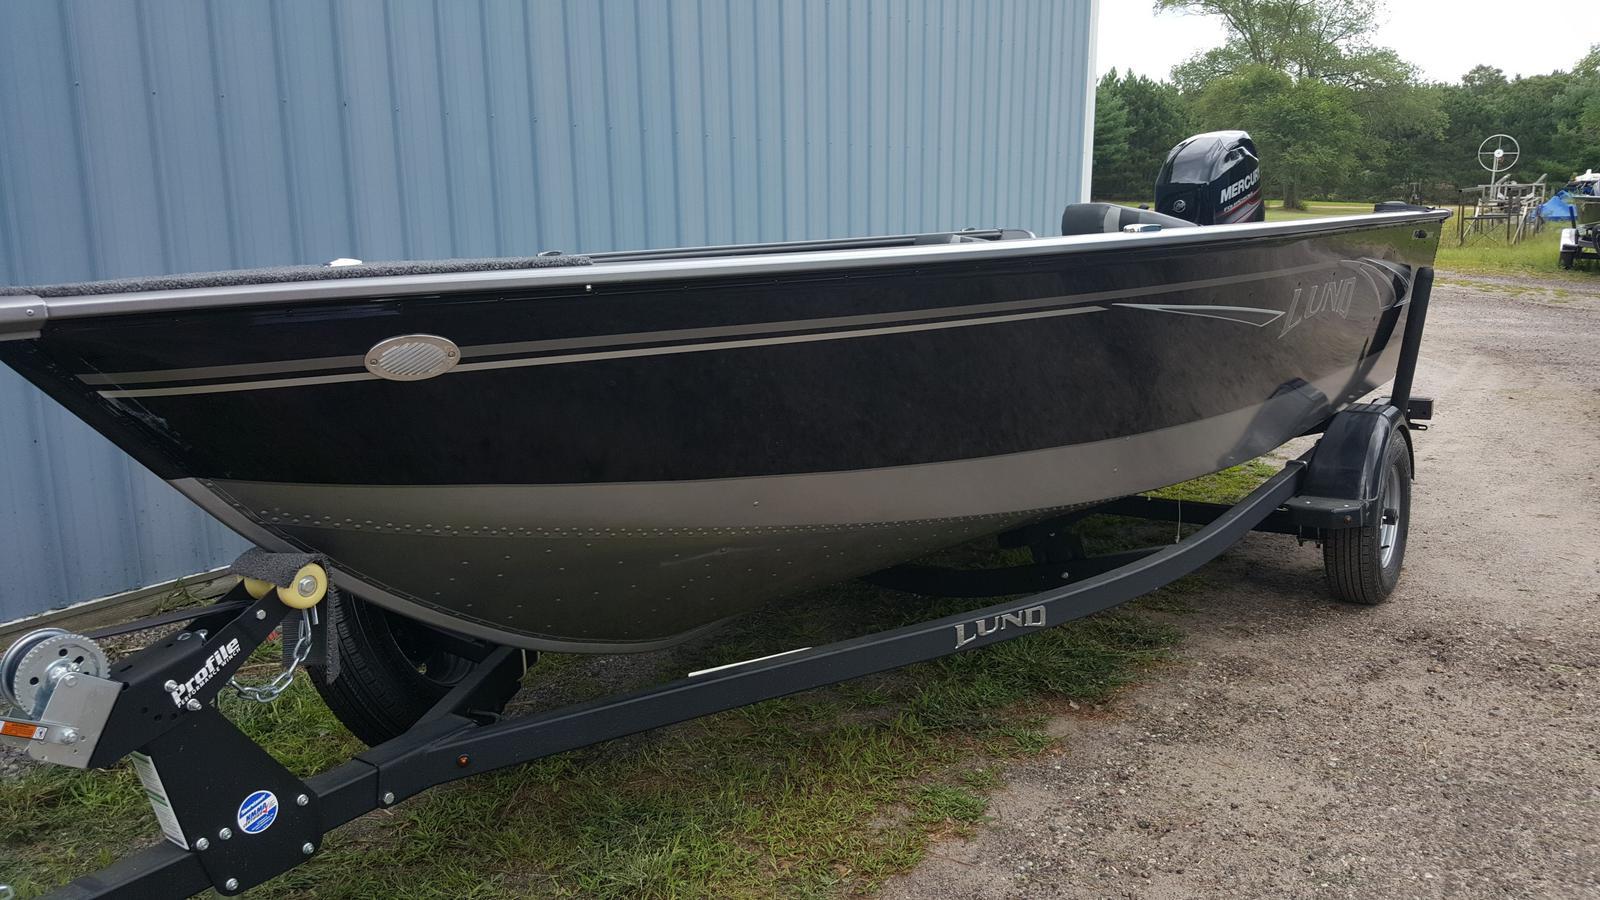 Inventory Badger Marine Nekoosa, WI (715) 886-3308